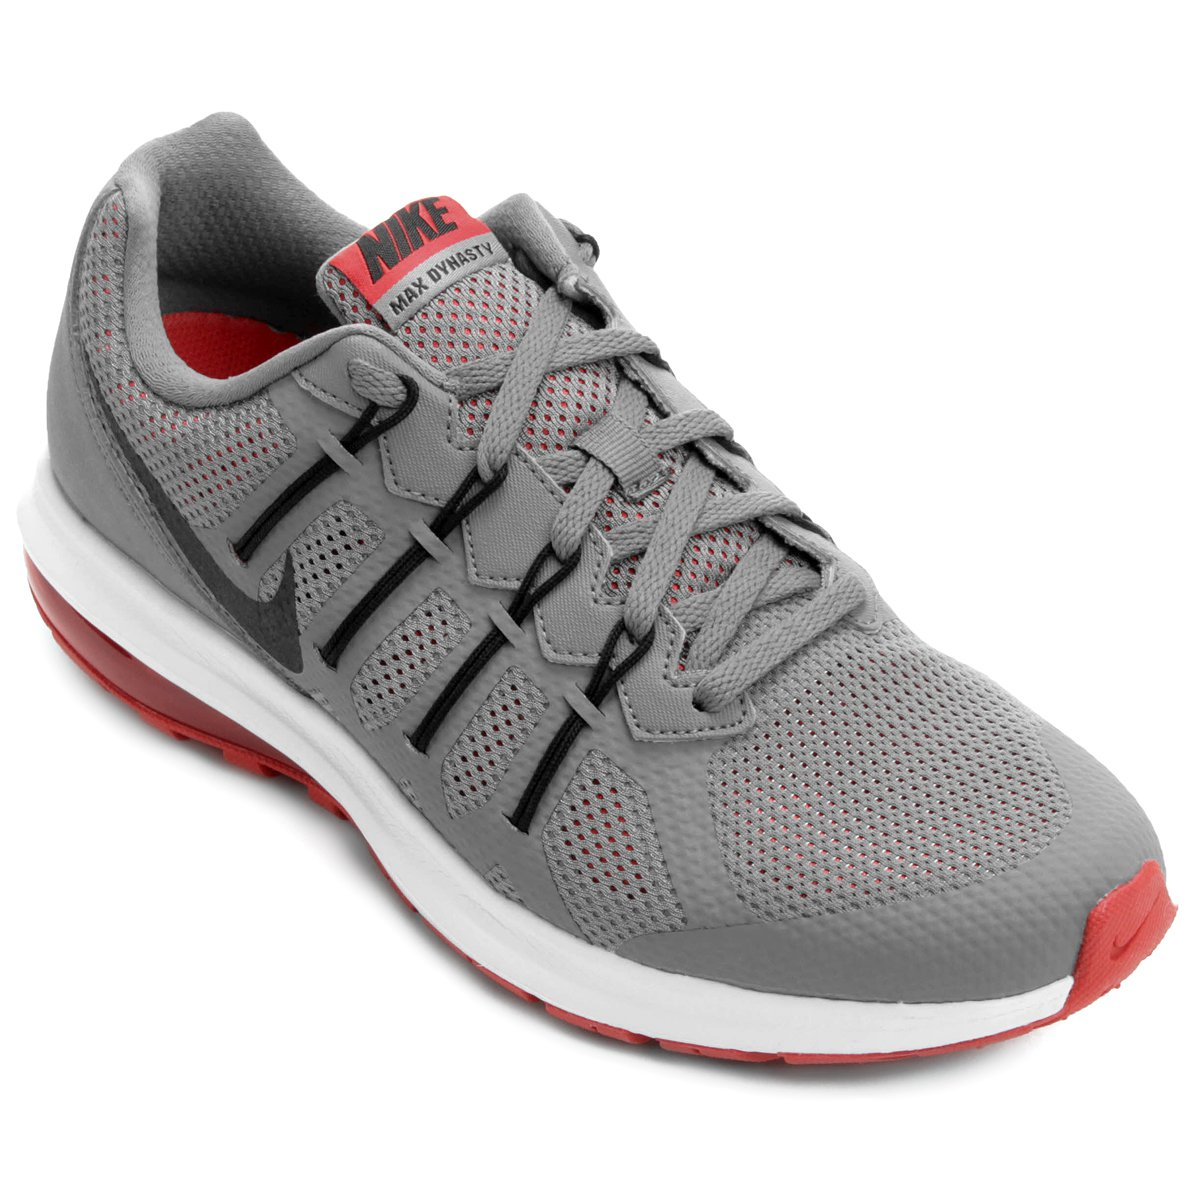 aaa04fc273 Tênis Nike Air Max Dynasty MSL Masculino - Compre Agora